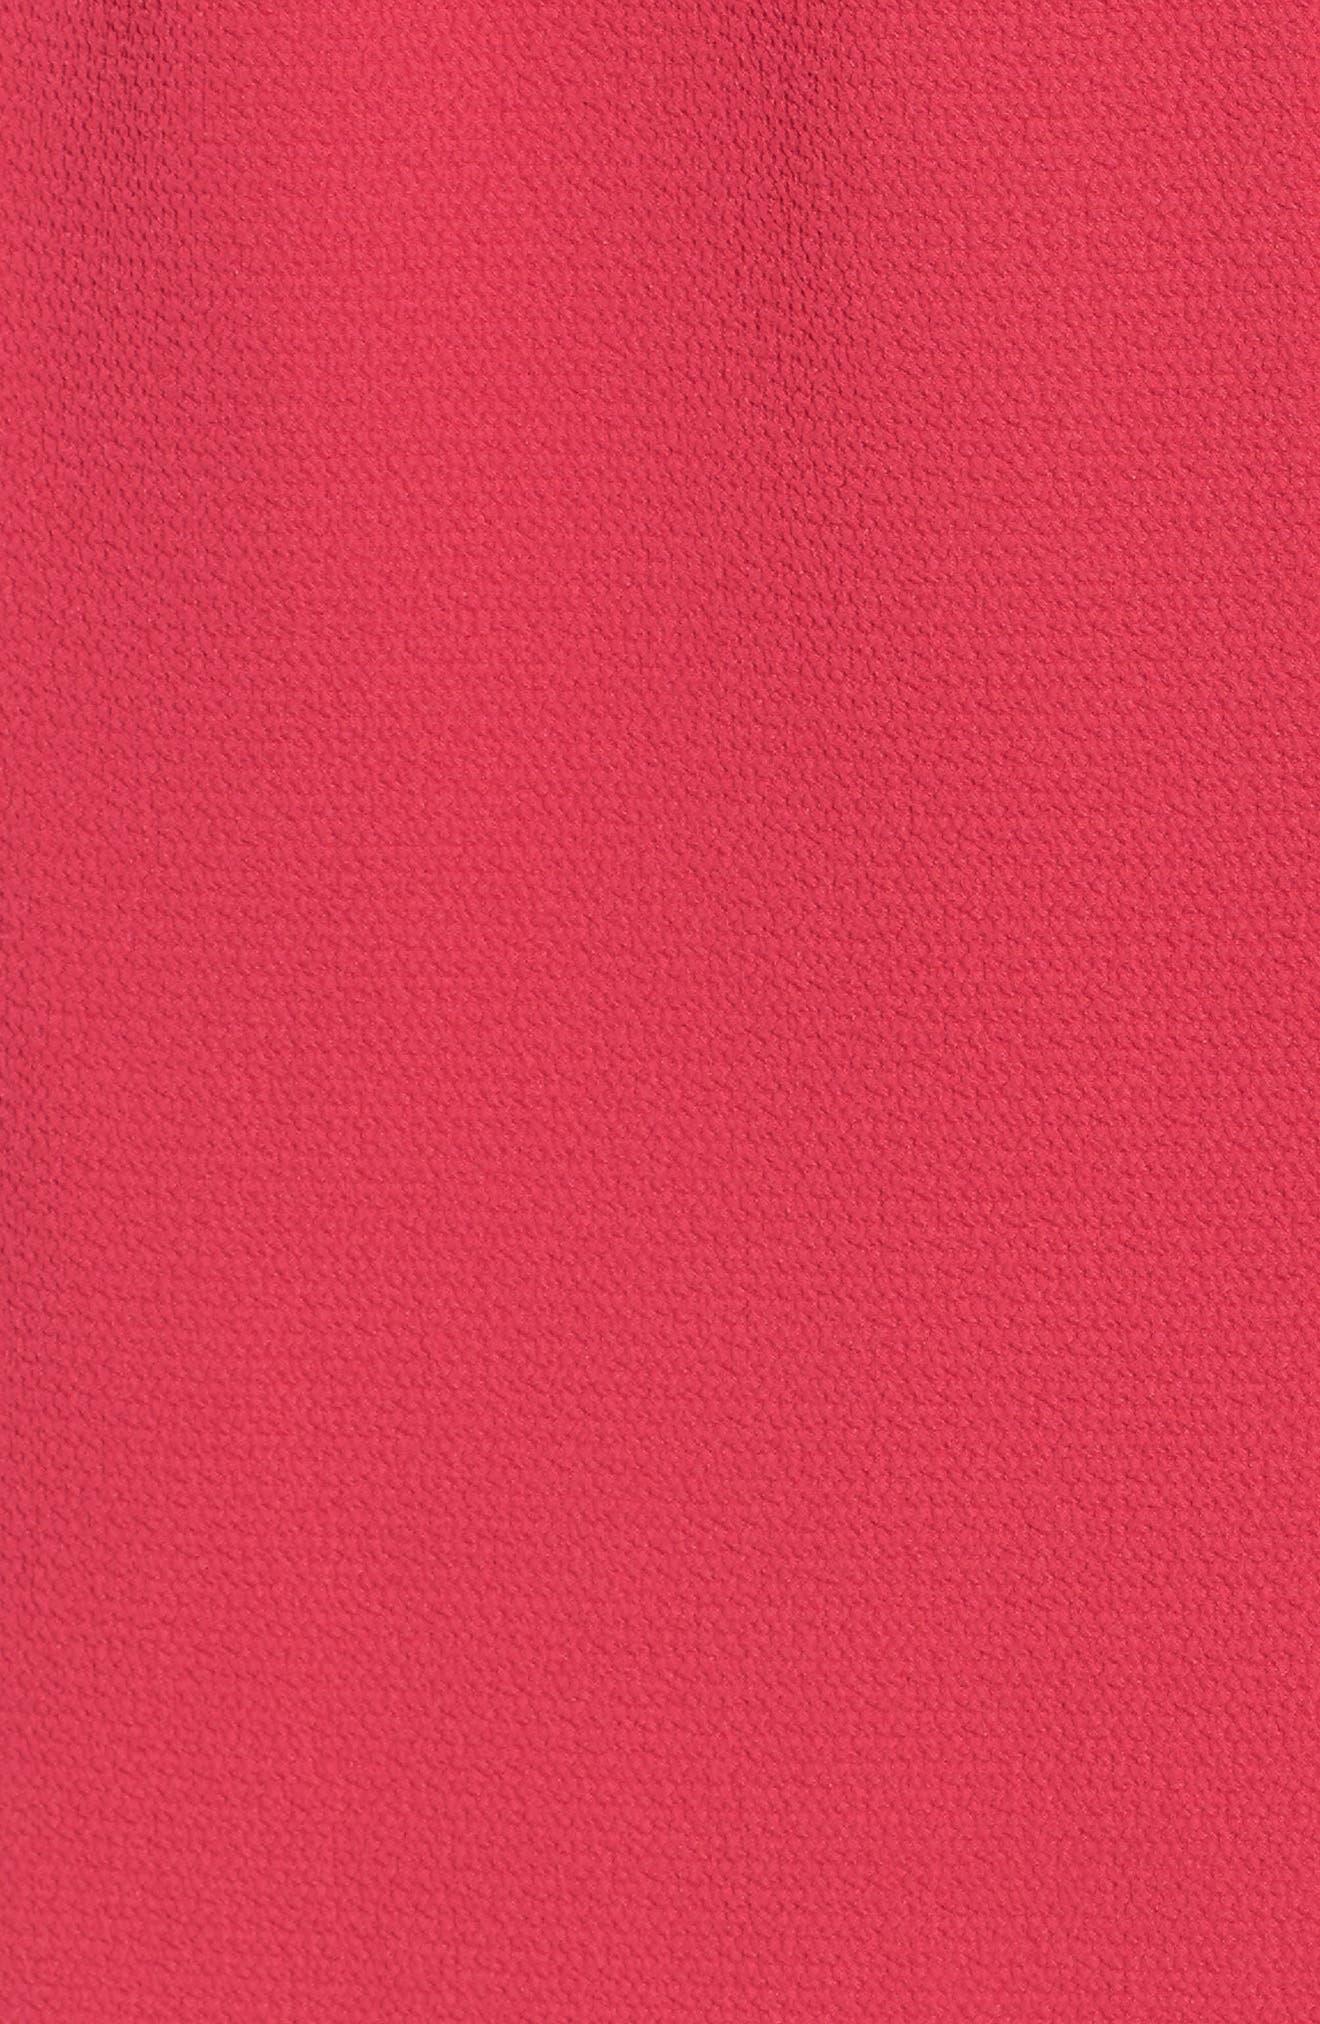 Stretch Crepe Dress,                             Alternate thumbnail 26, color,